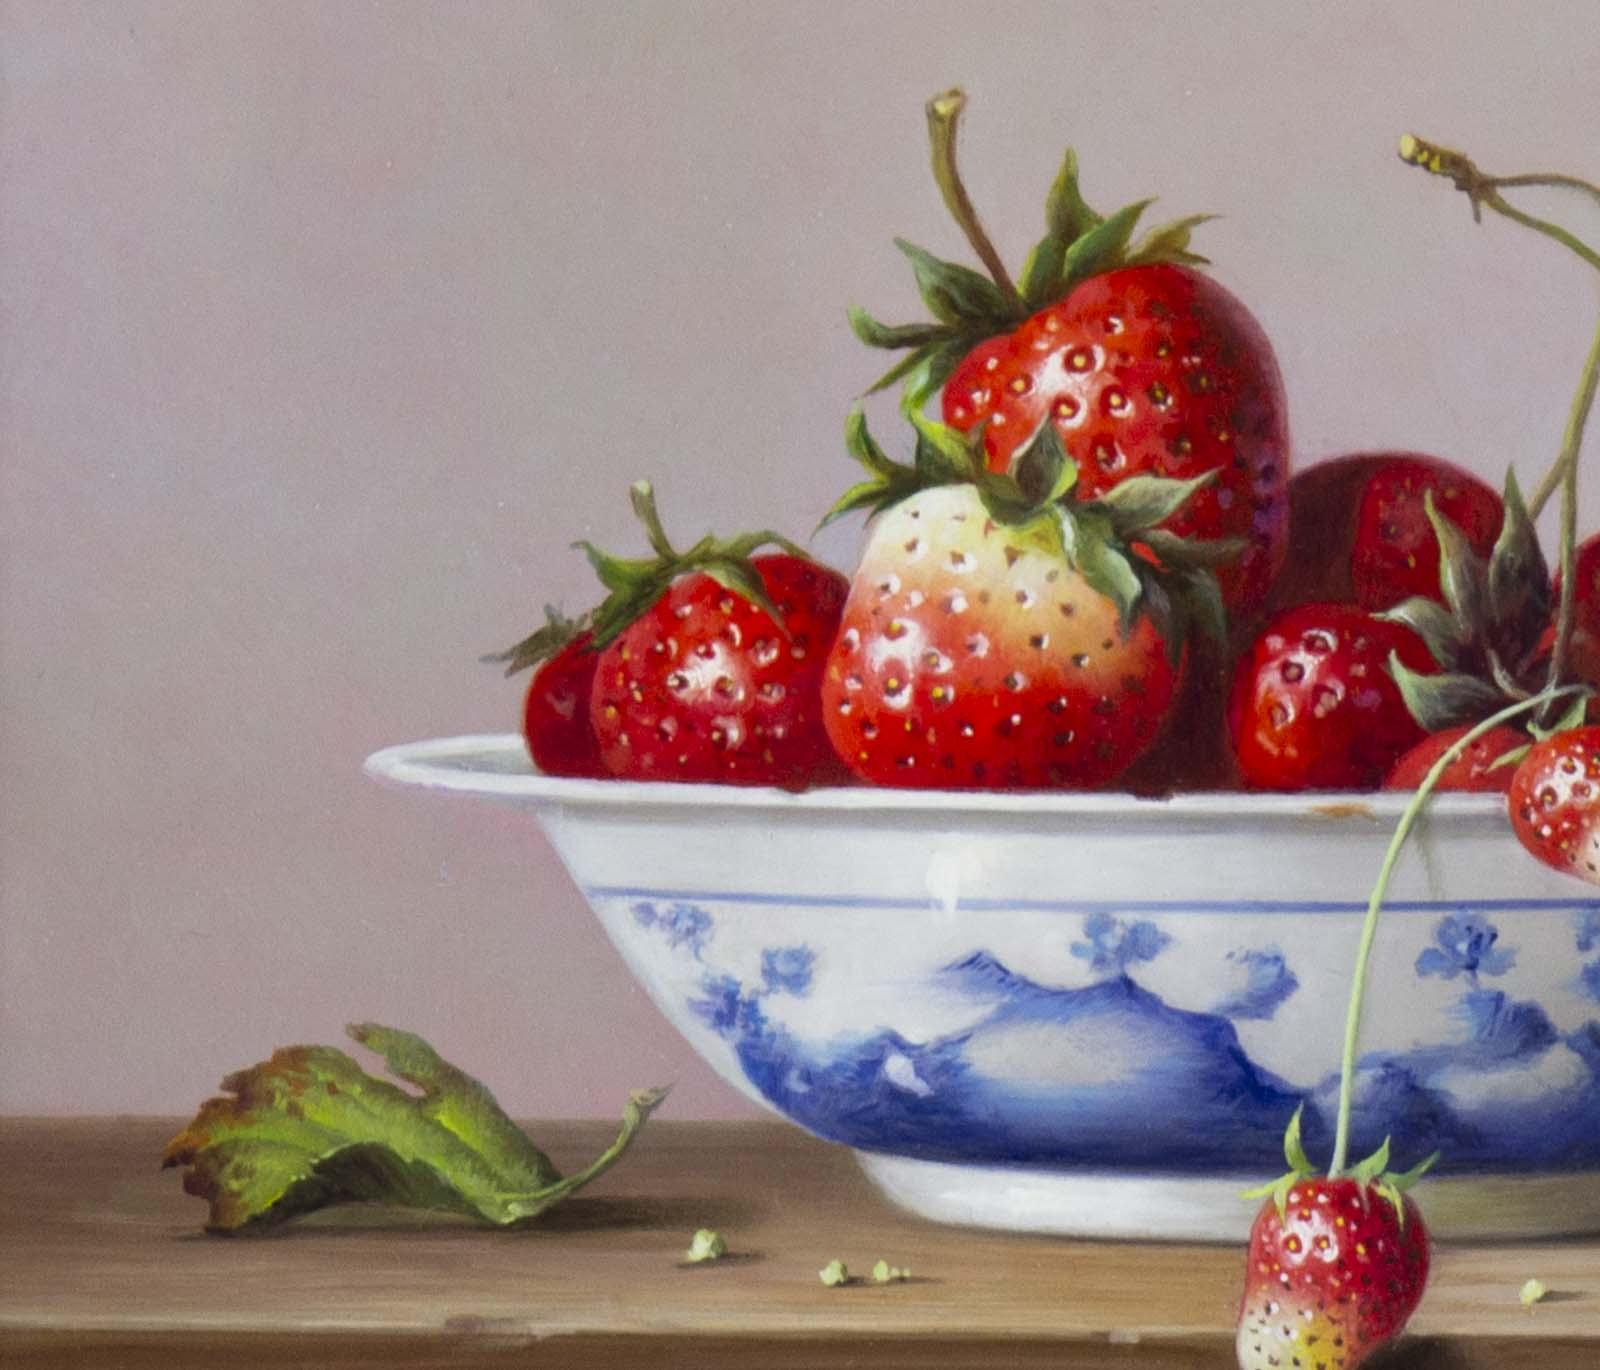 Strawberries in Porcelain Bowl